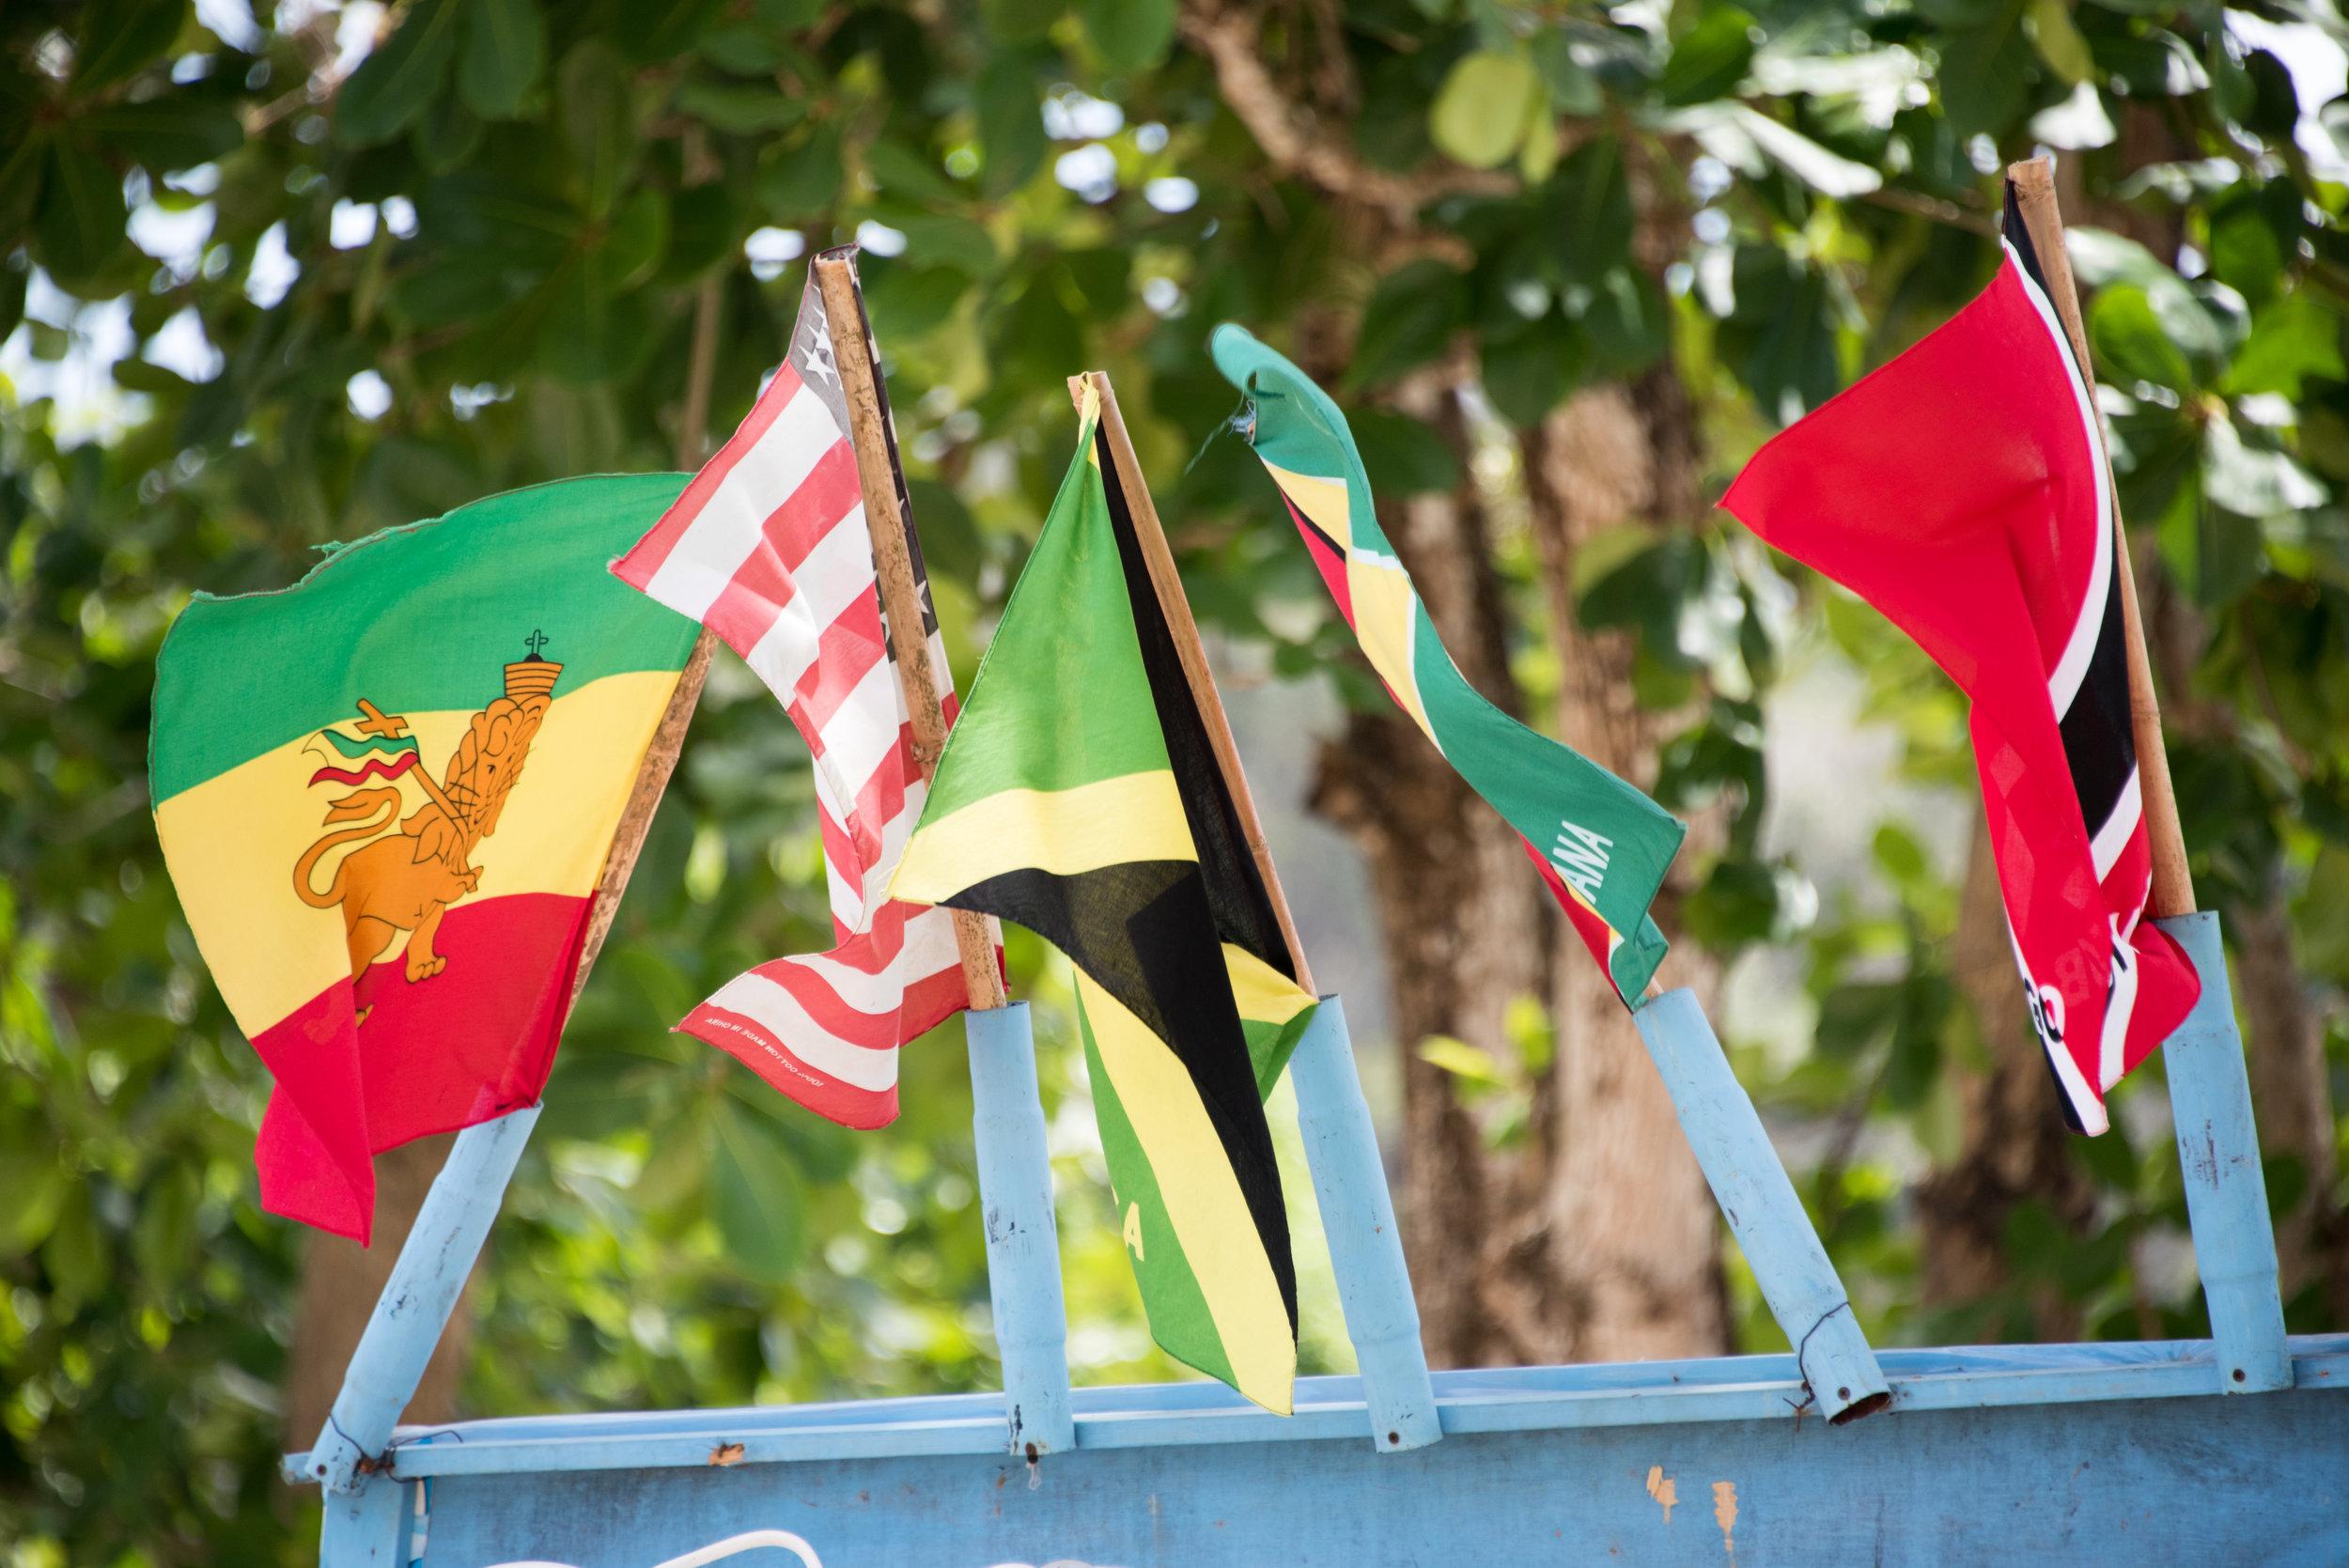 170422_Barrie Fisher_Tobago-1417.jpg